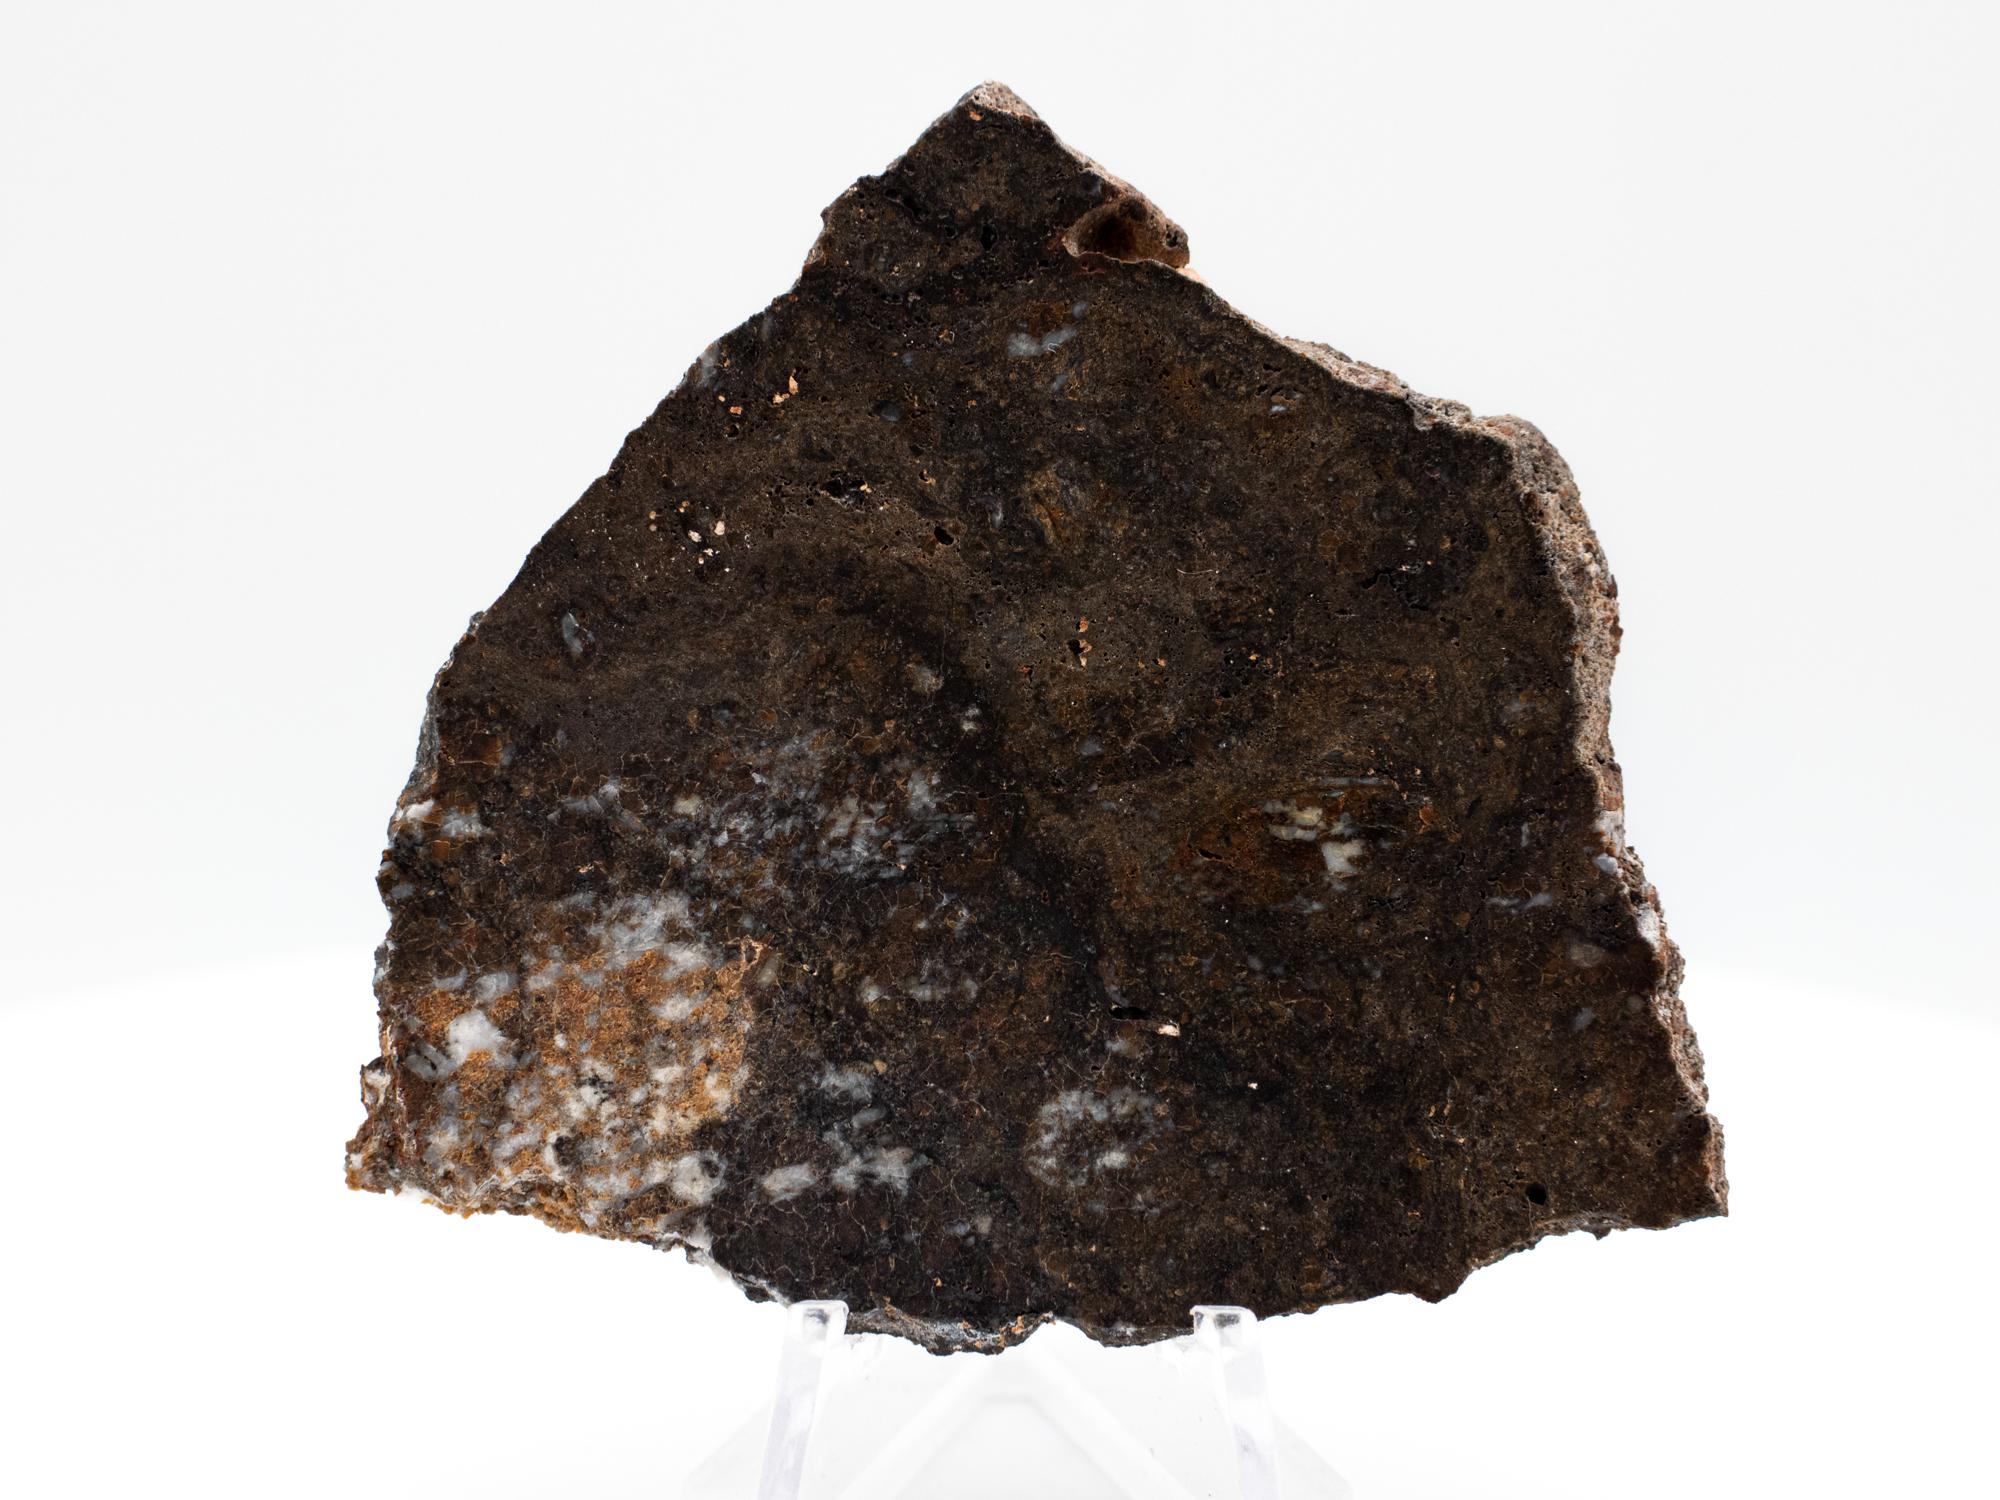 eucrite meteorite 25 g